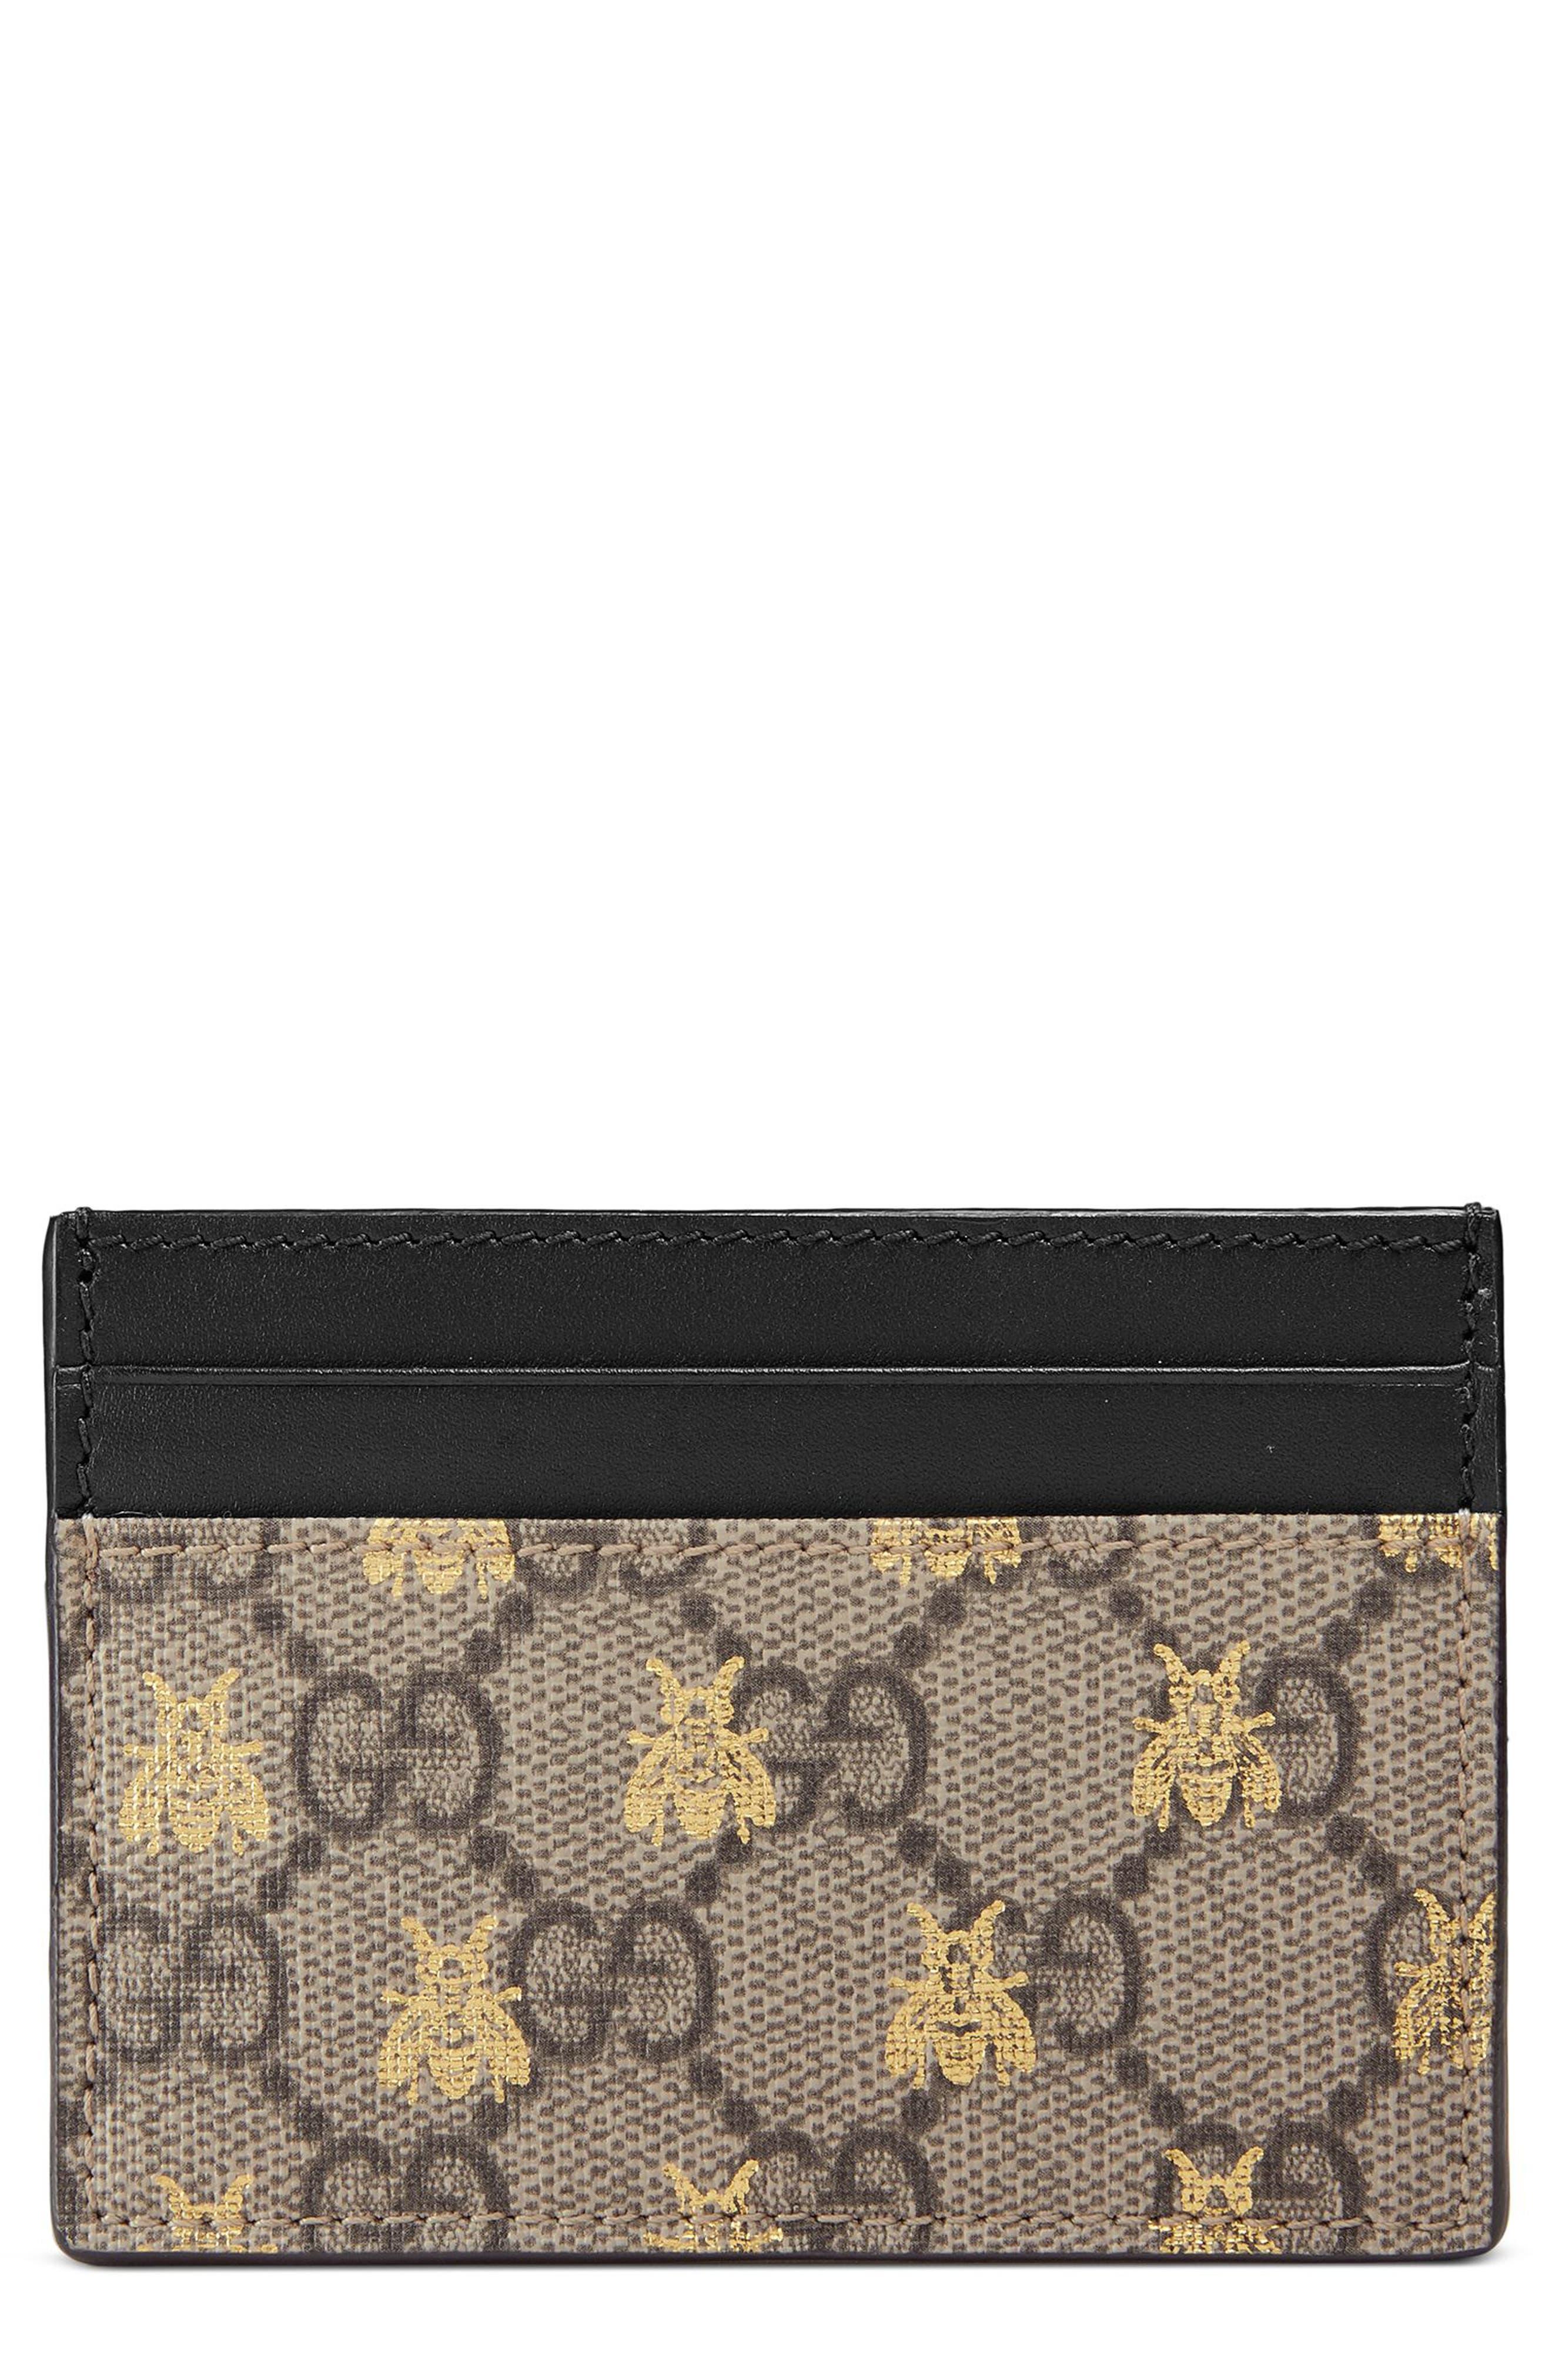 Gucci Linea Bee GG Card Case